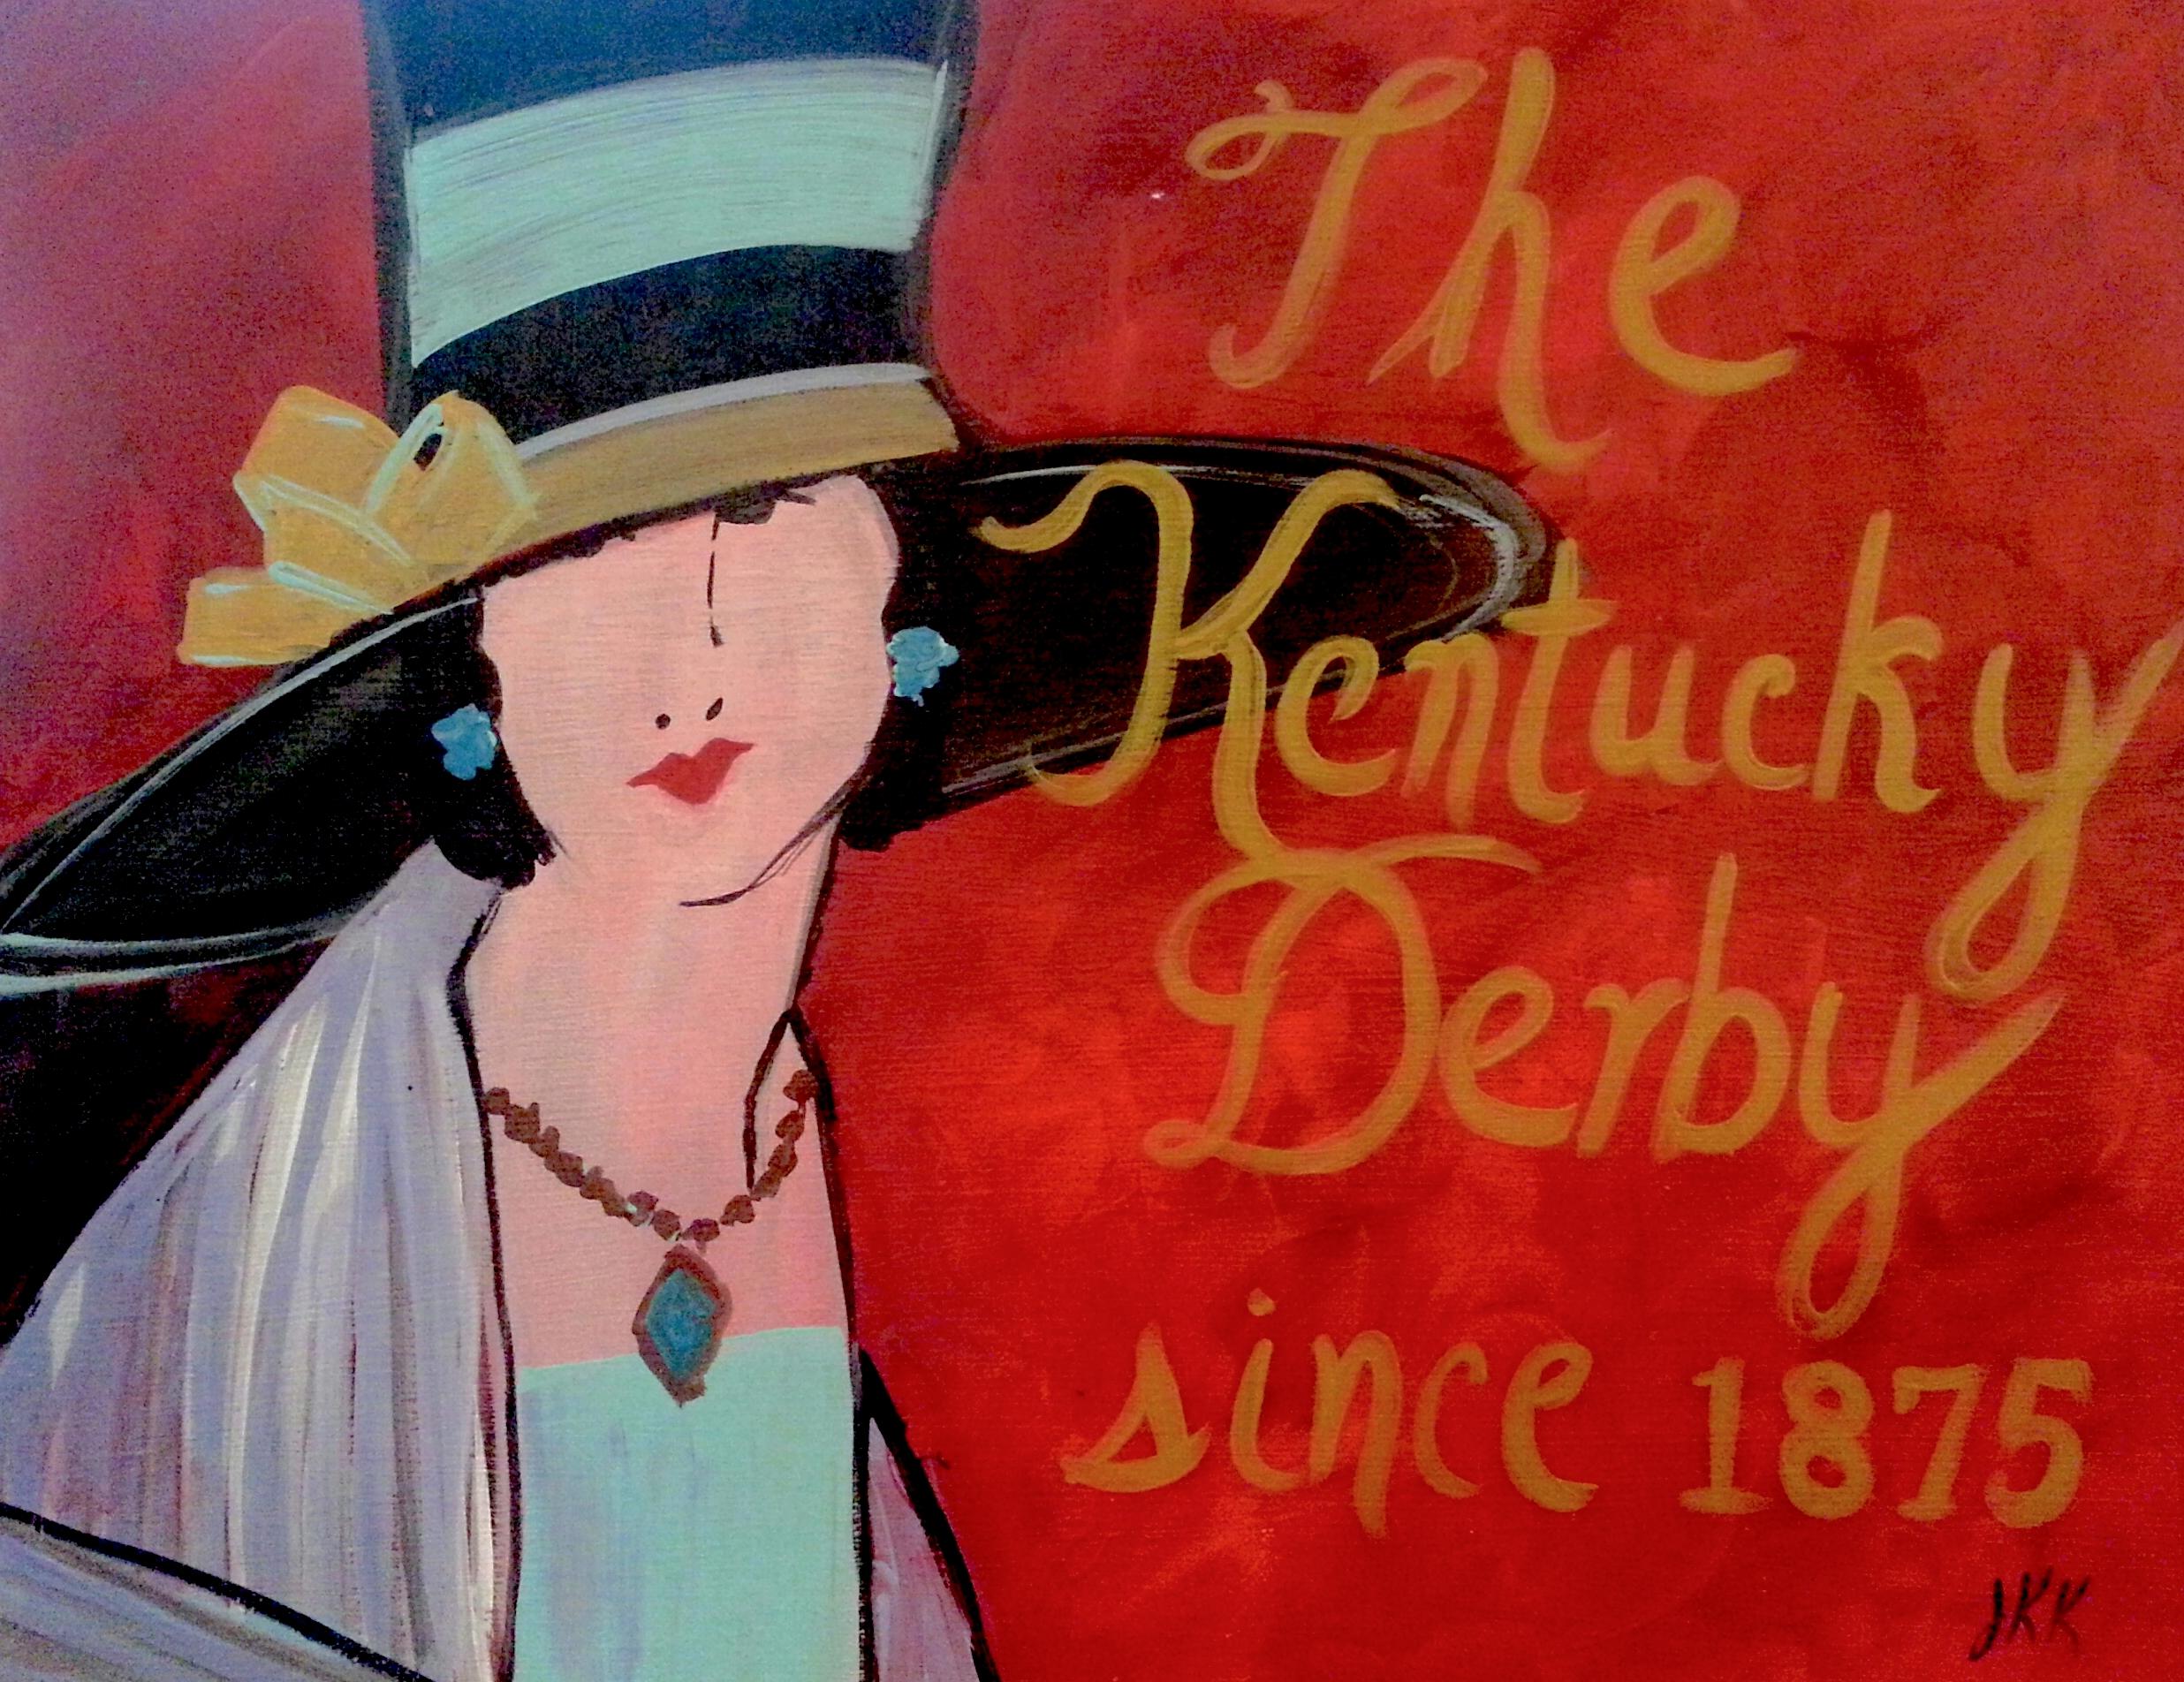 Derby Since 1875.jpg